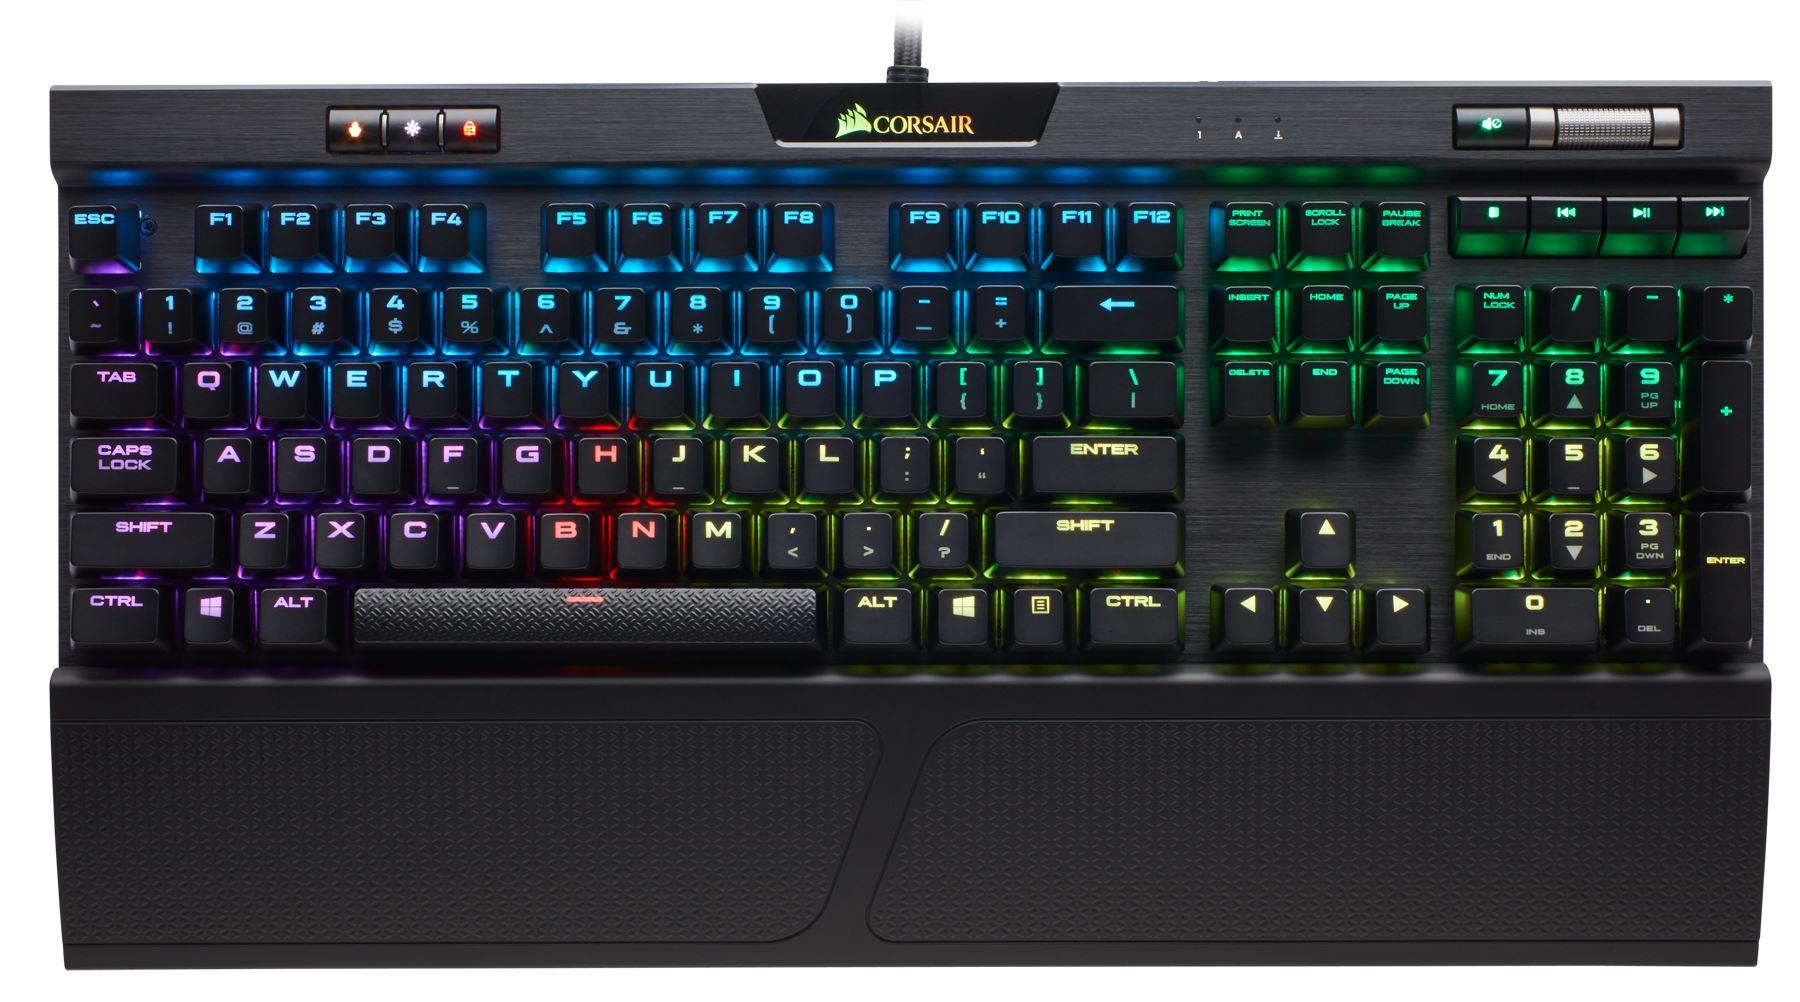 Corsair Launches New K70 RGB MK 2 and STRAFE RGB MK 2 Mechanical